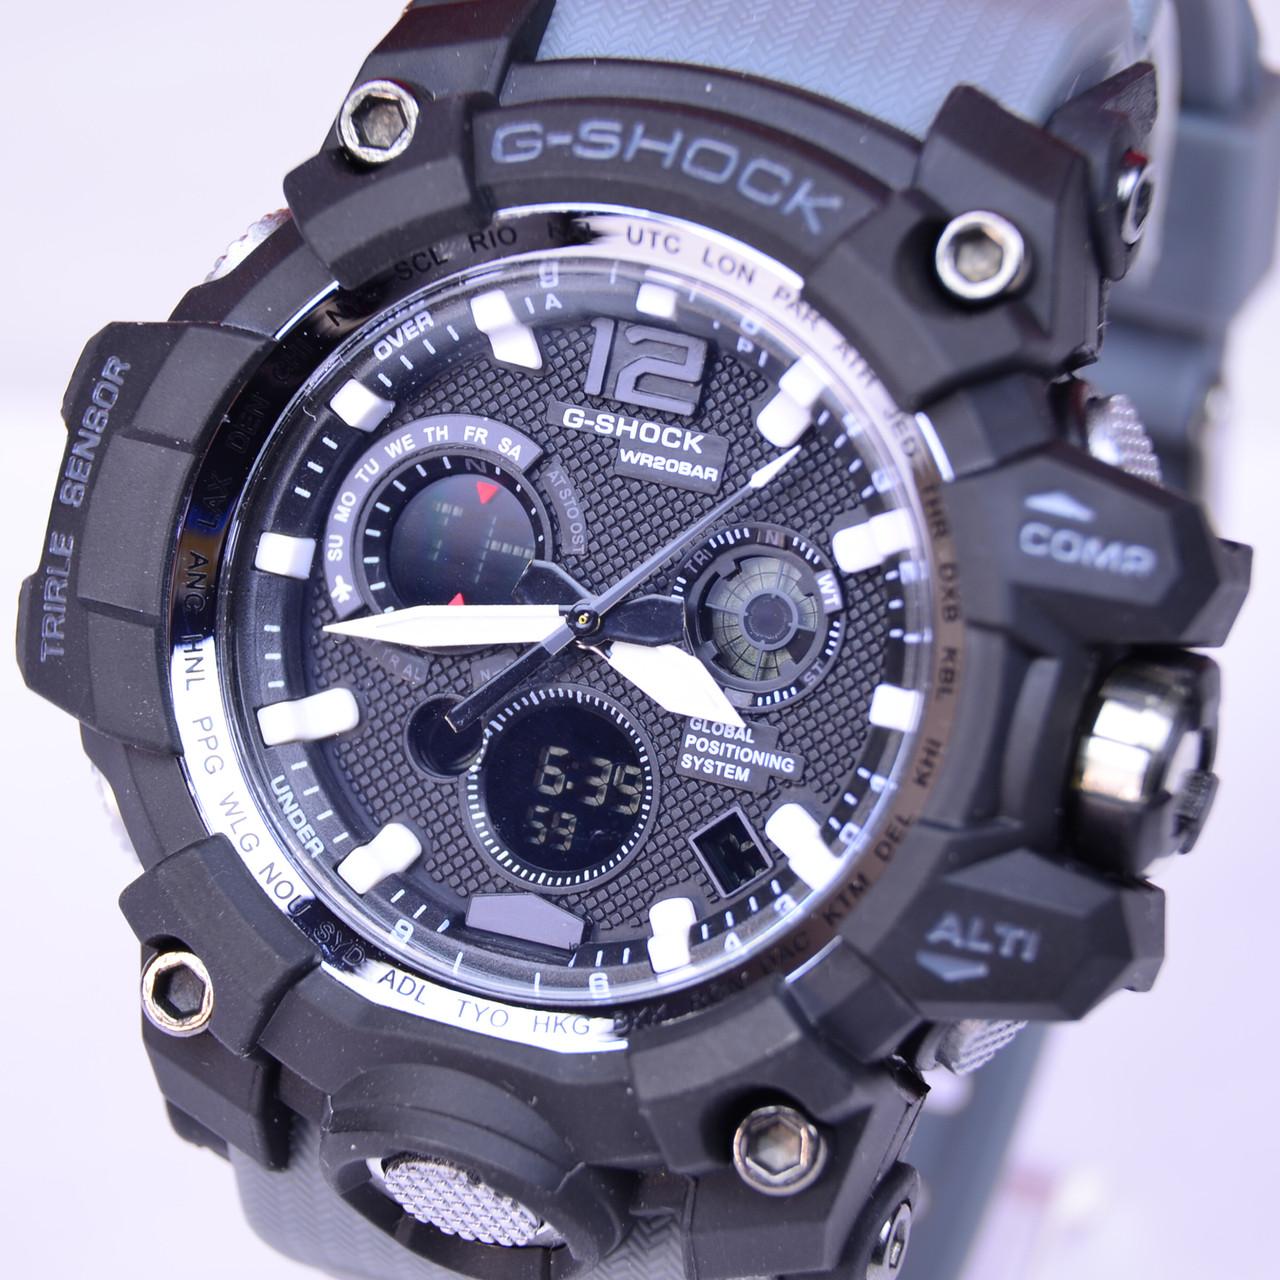 Часы наручные G-SHOCK черные с серым